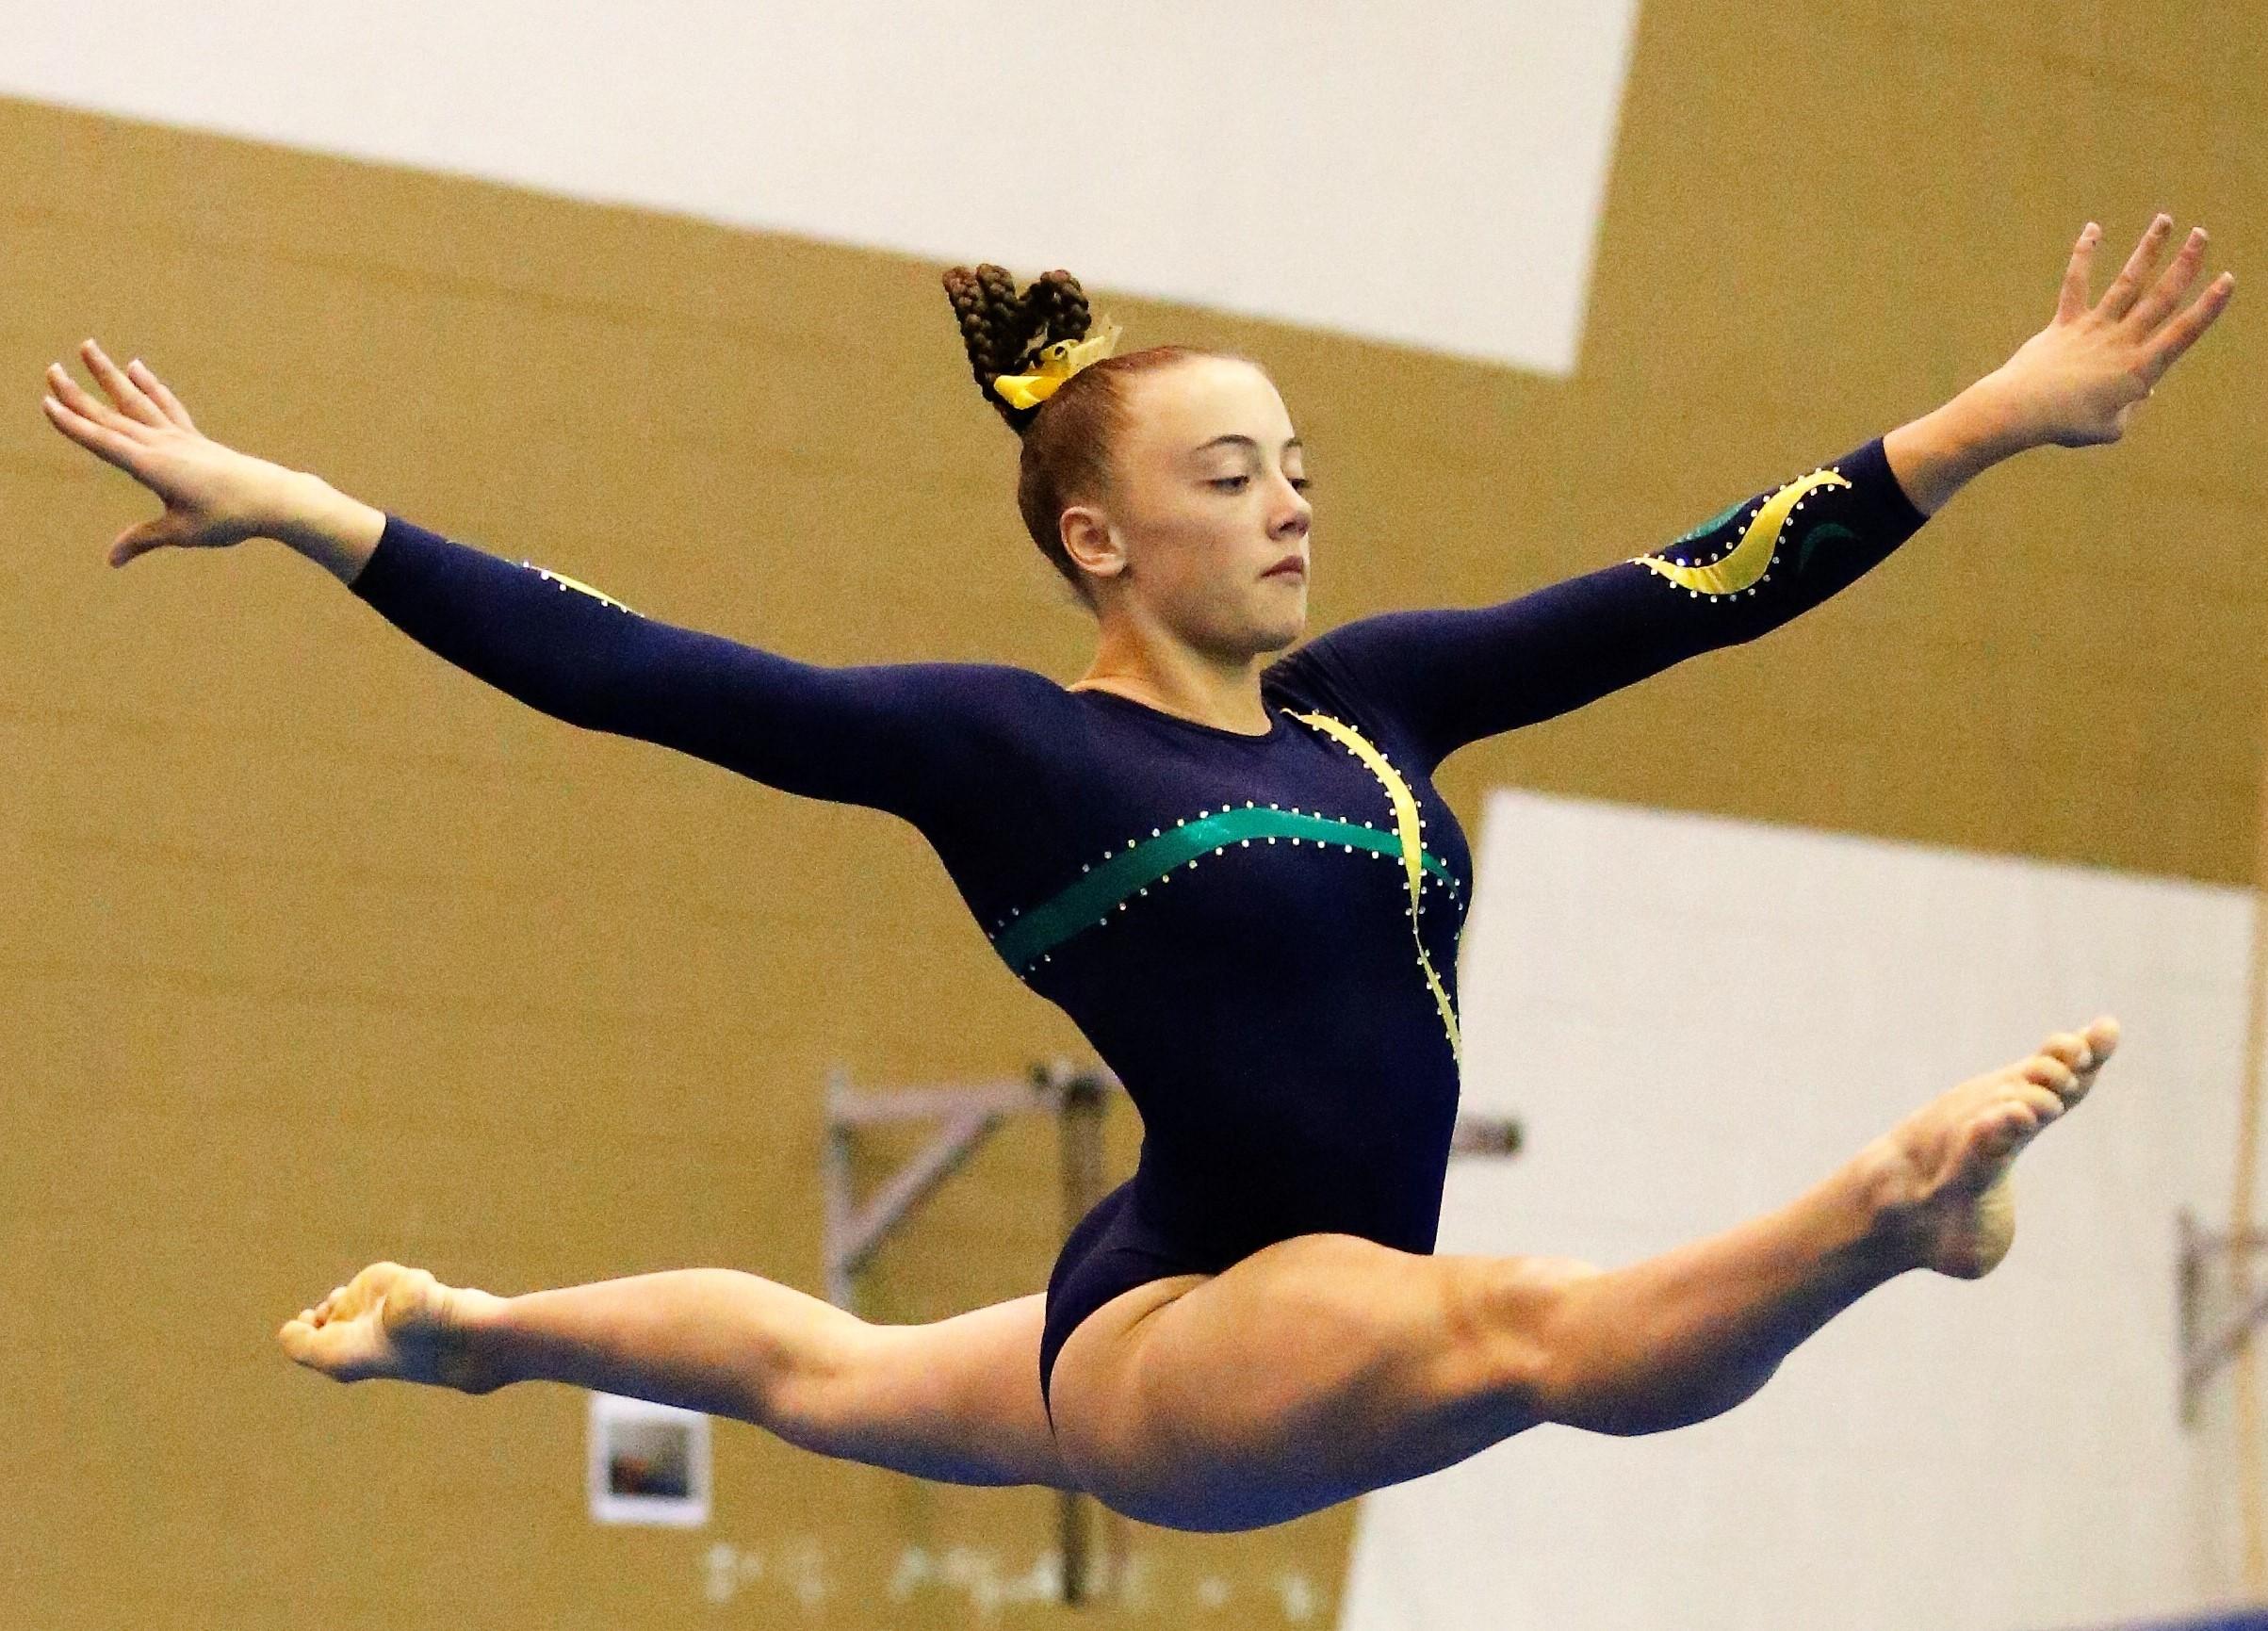 Gymnasts Shine at QGSSSA Artistic Meet